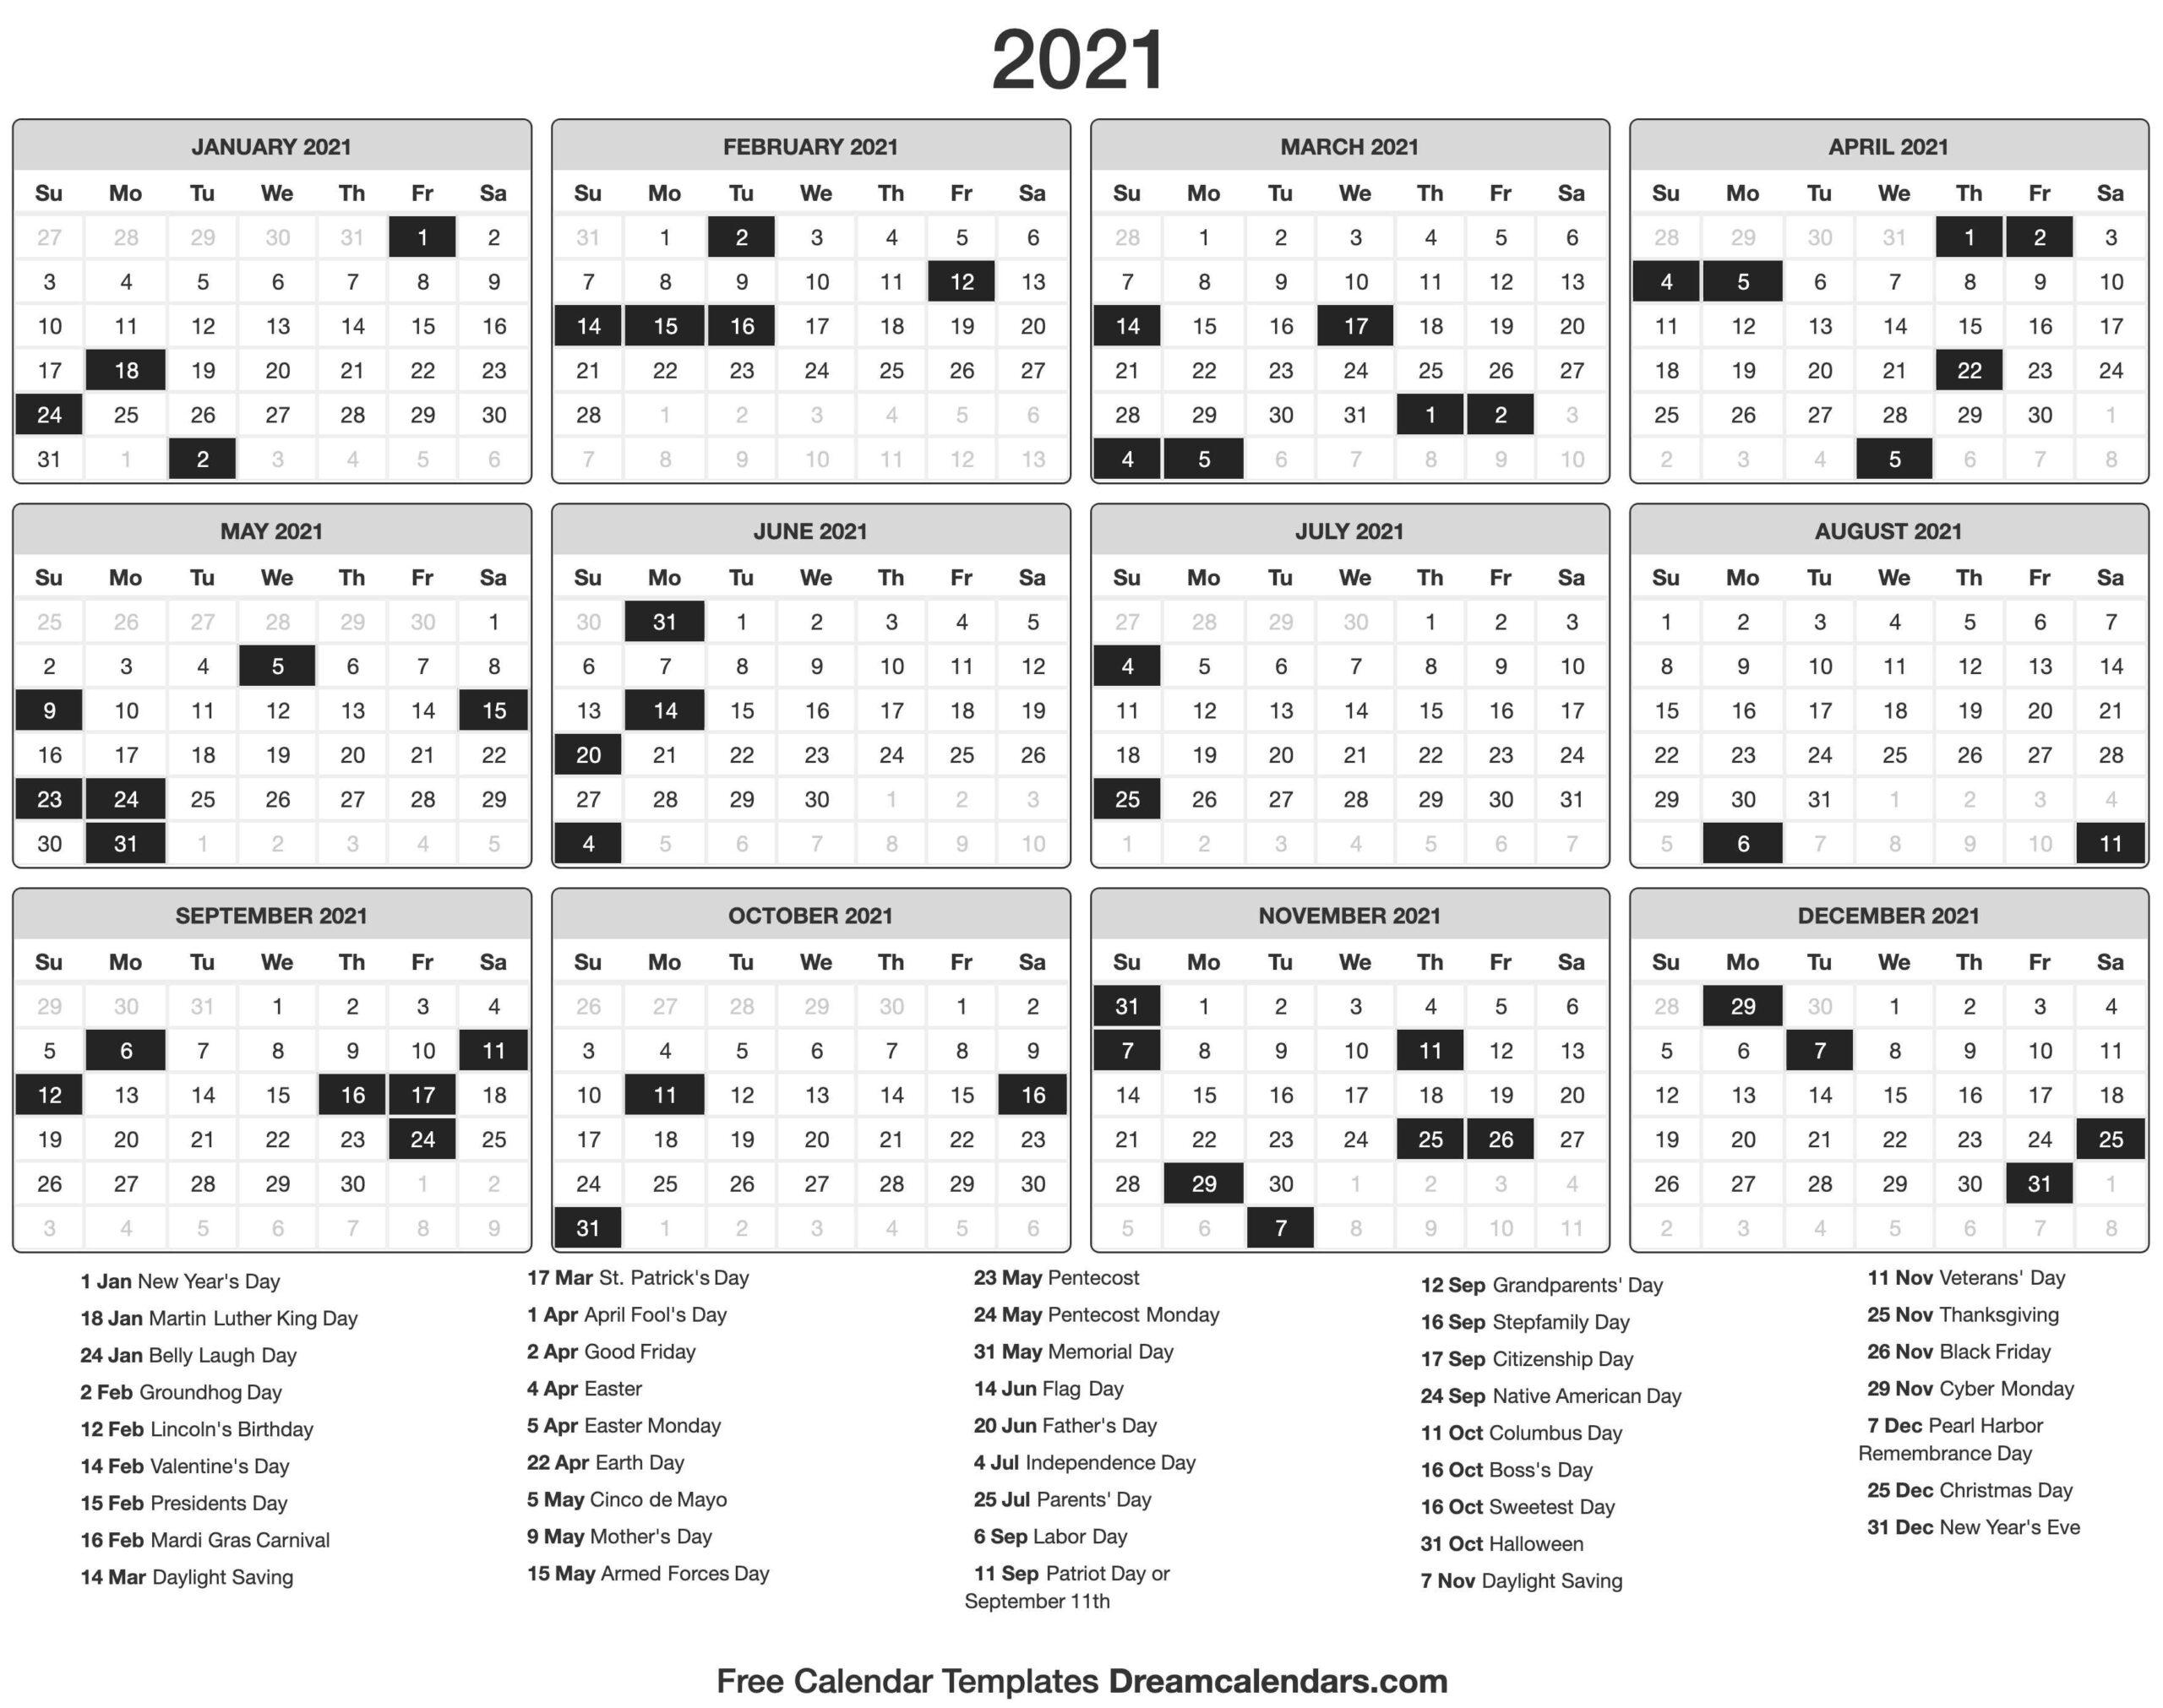 2021 Calendar-2021 Office Vacation Calendar Examples